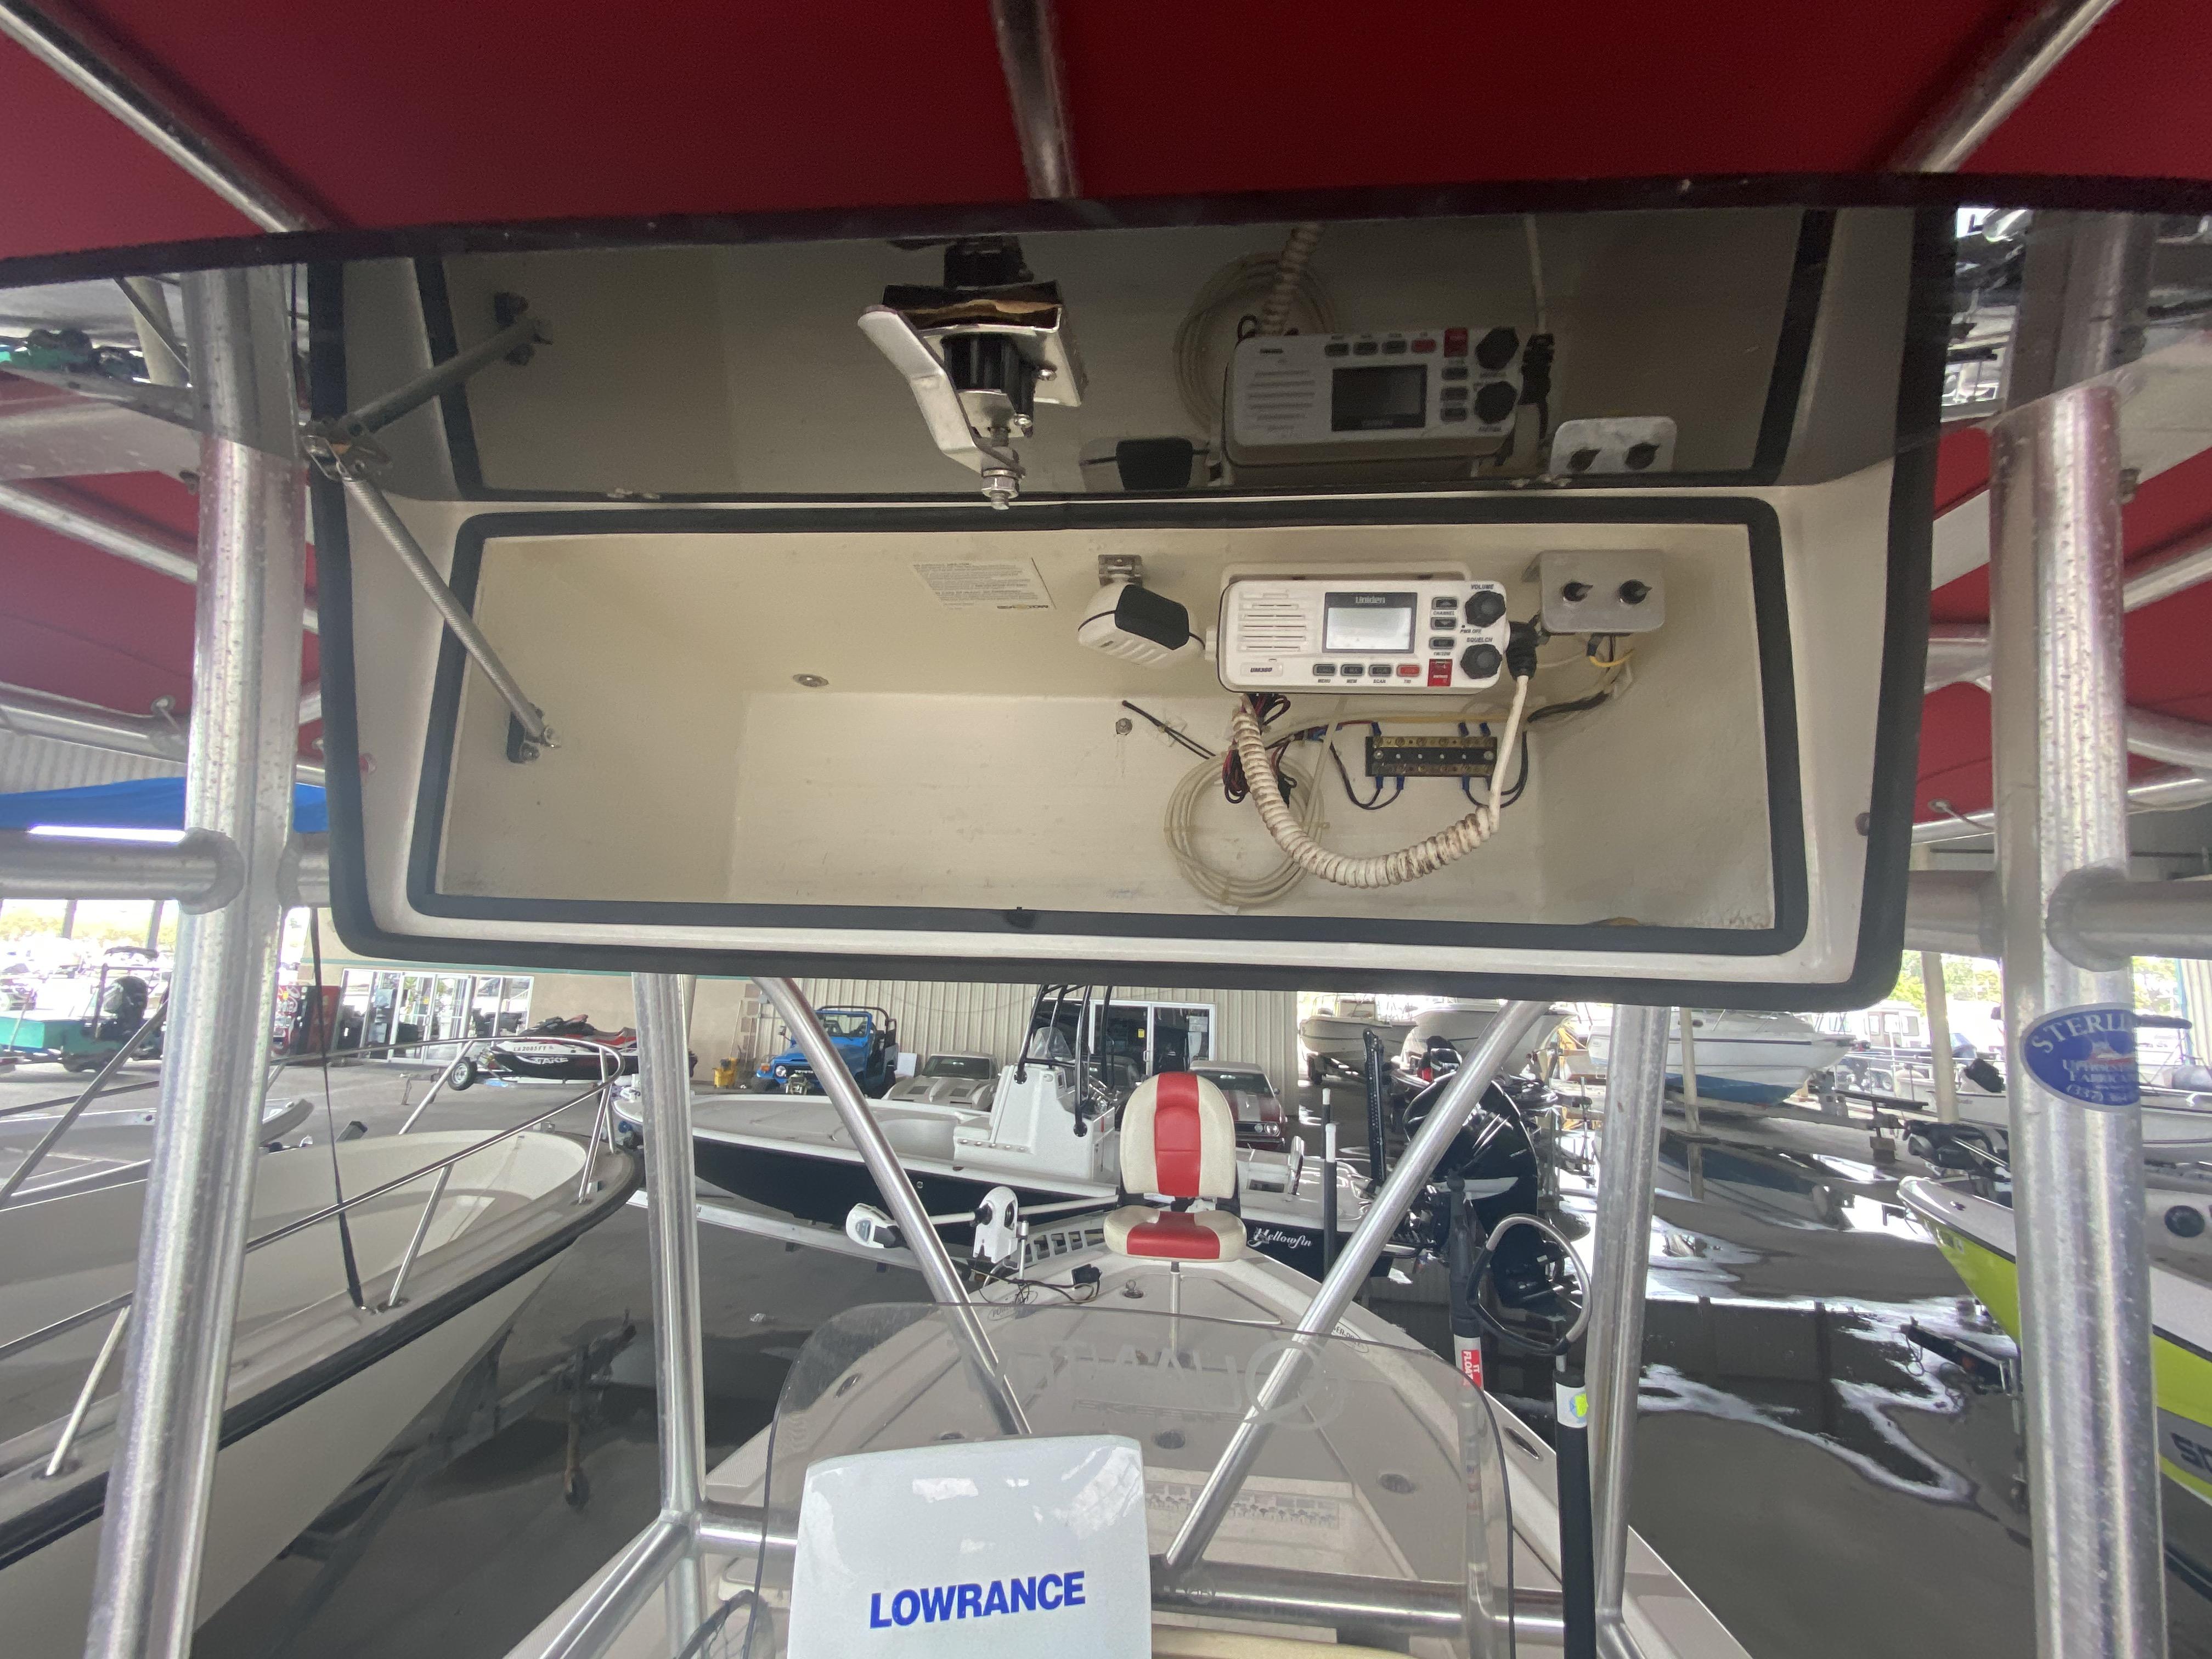 2010 Skeeter boat for sale, model of the boat is ZX24V & Image # 14 of 16